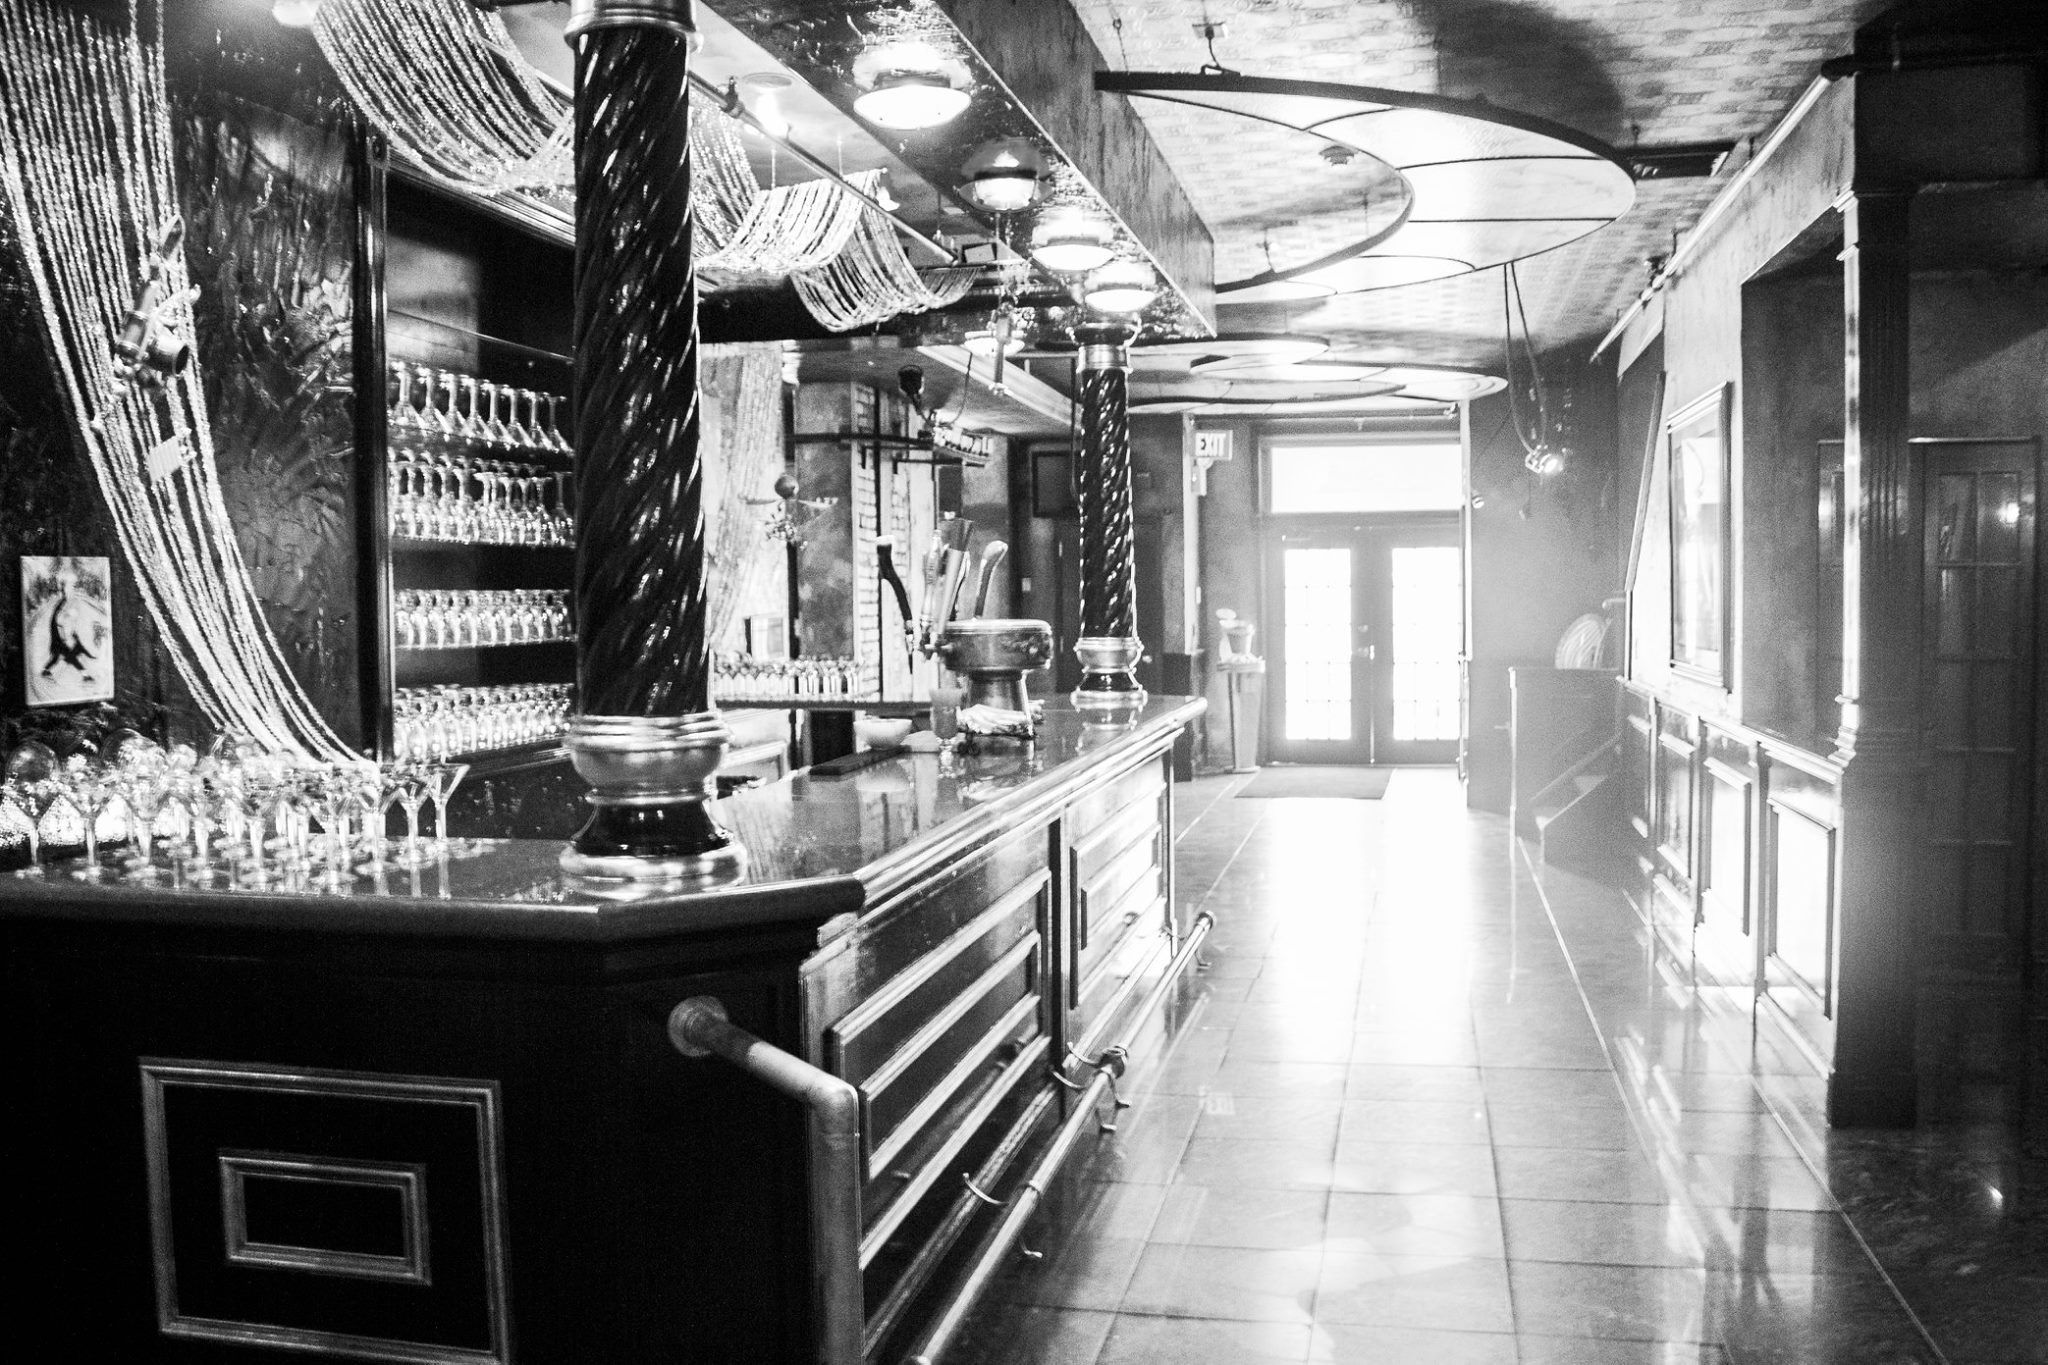 Bar Area | Beatstreet Station | Bar areas, Bar, Space